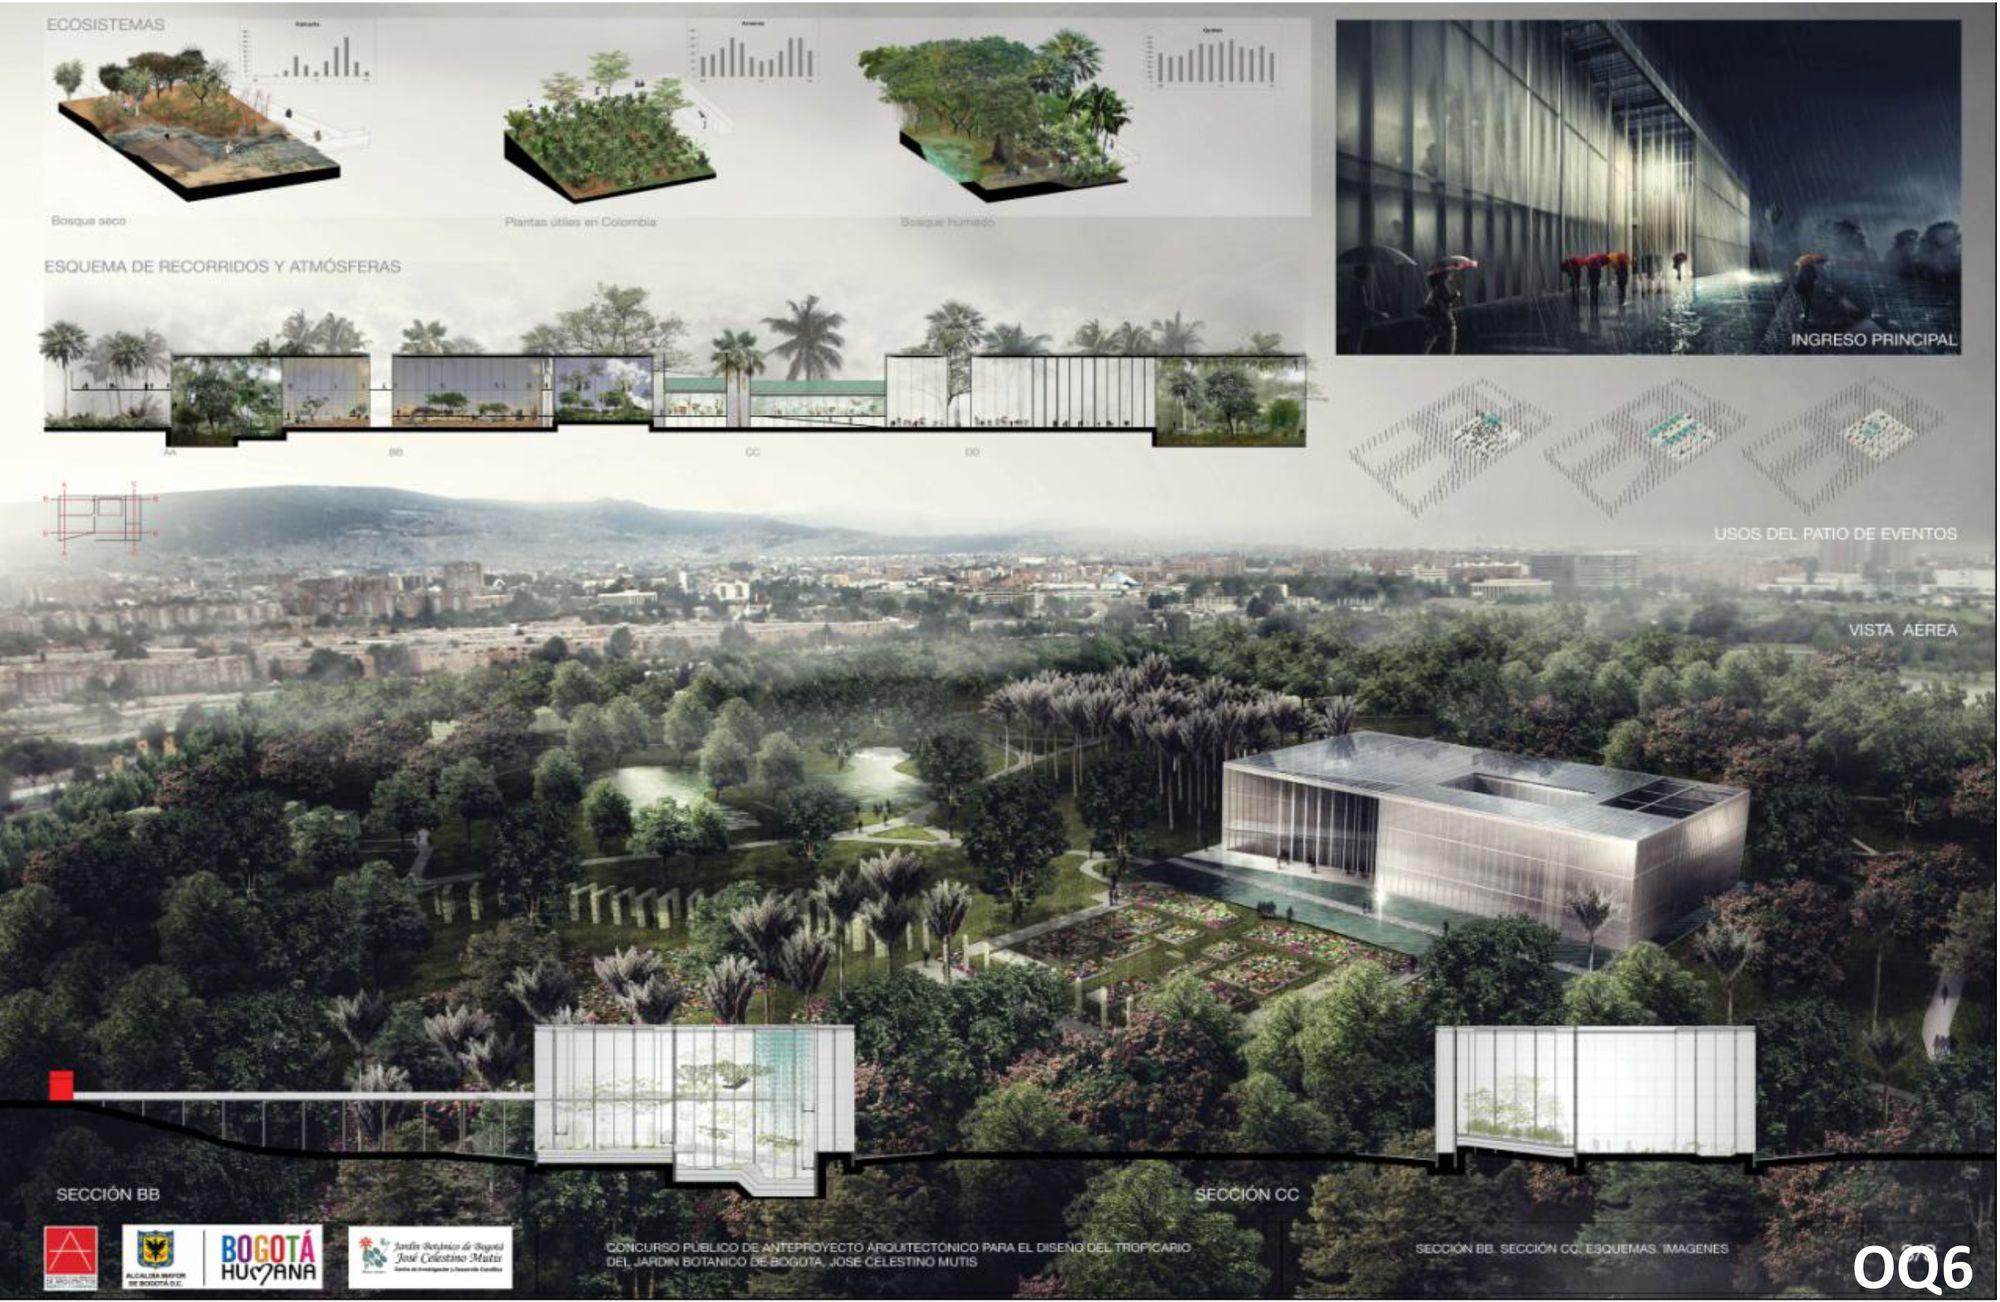 Laminas Ganadoras Concursos Arquitectura Google Search